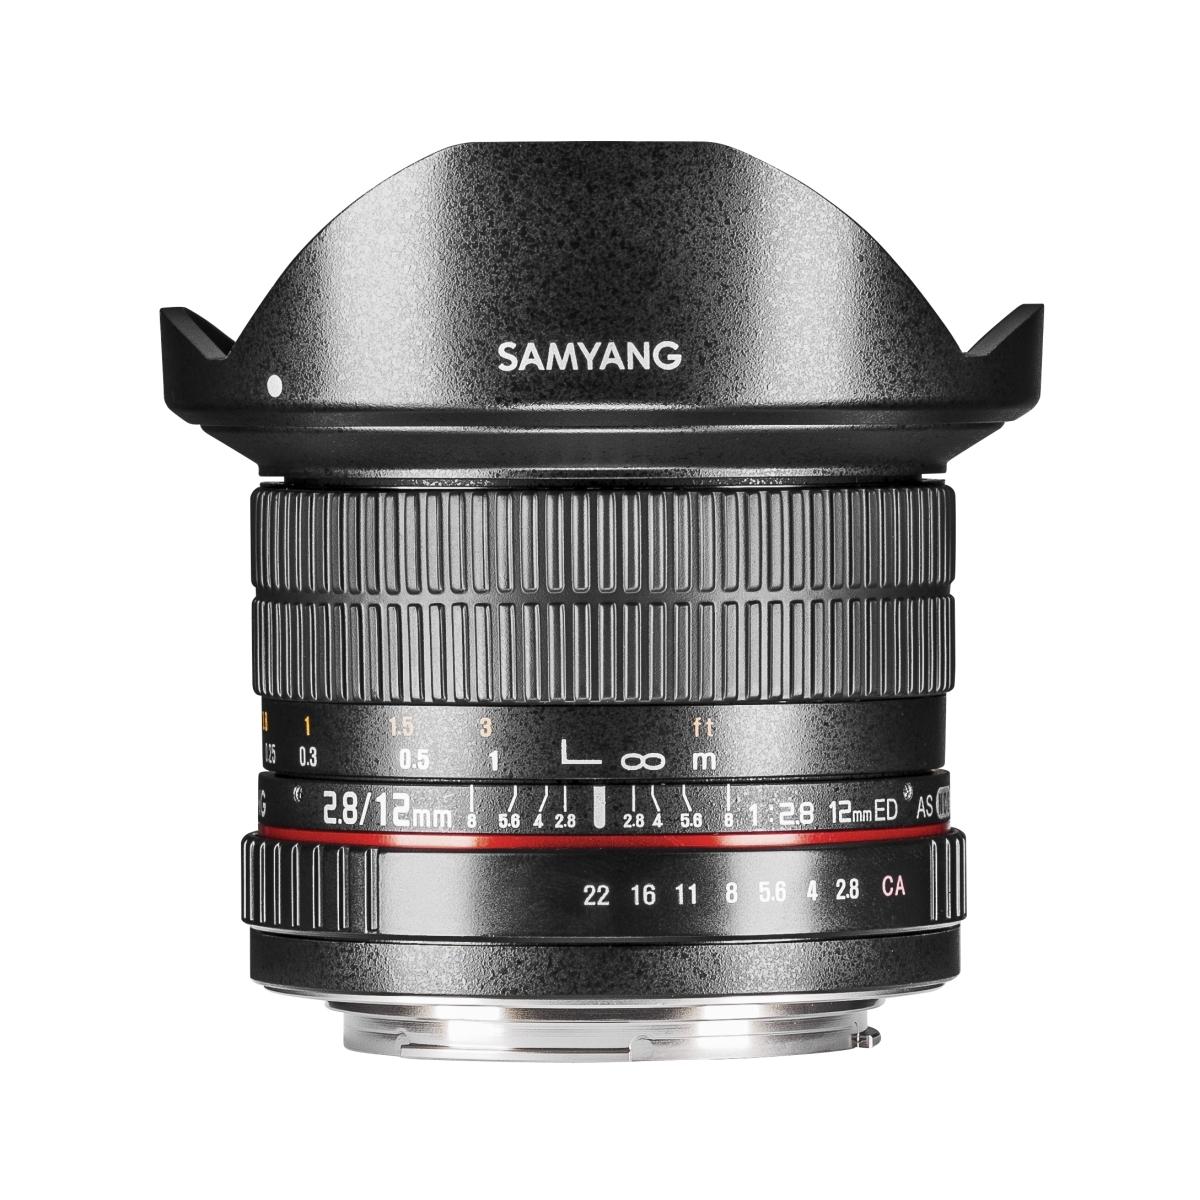 Samyang MF 12 mm 1:2,8 Fisheye für Fujifilm X